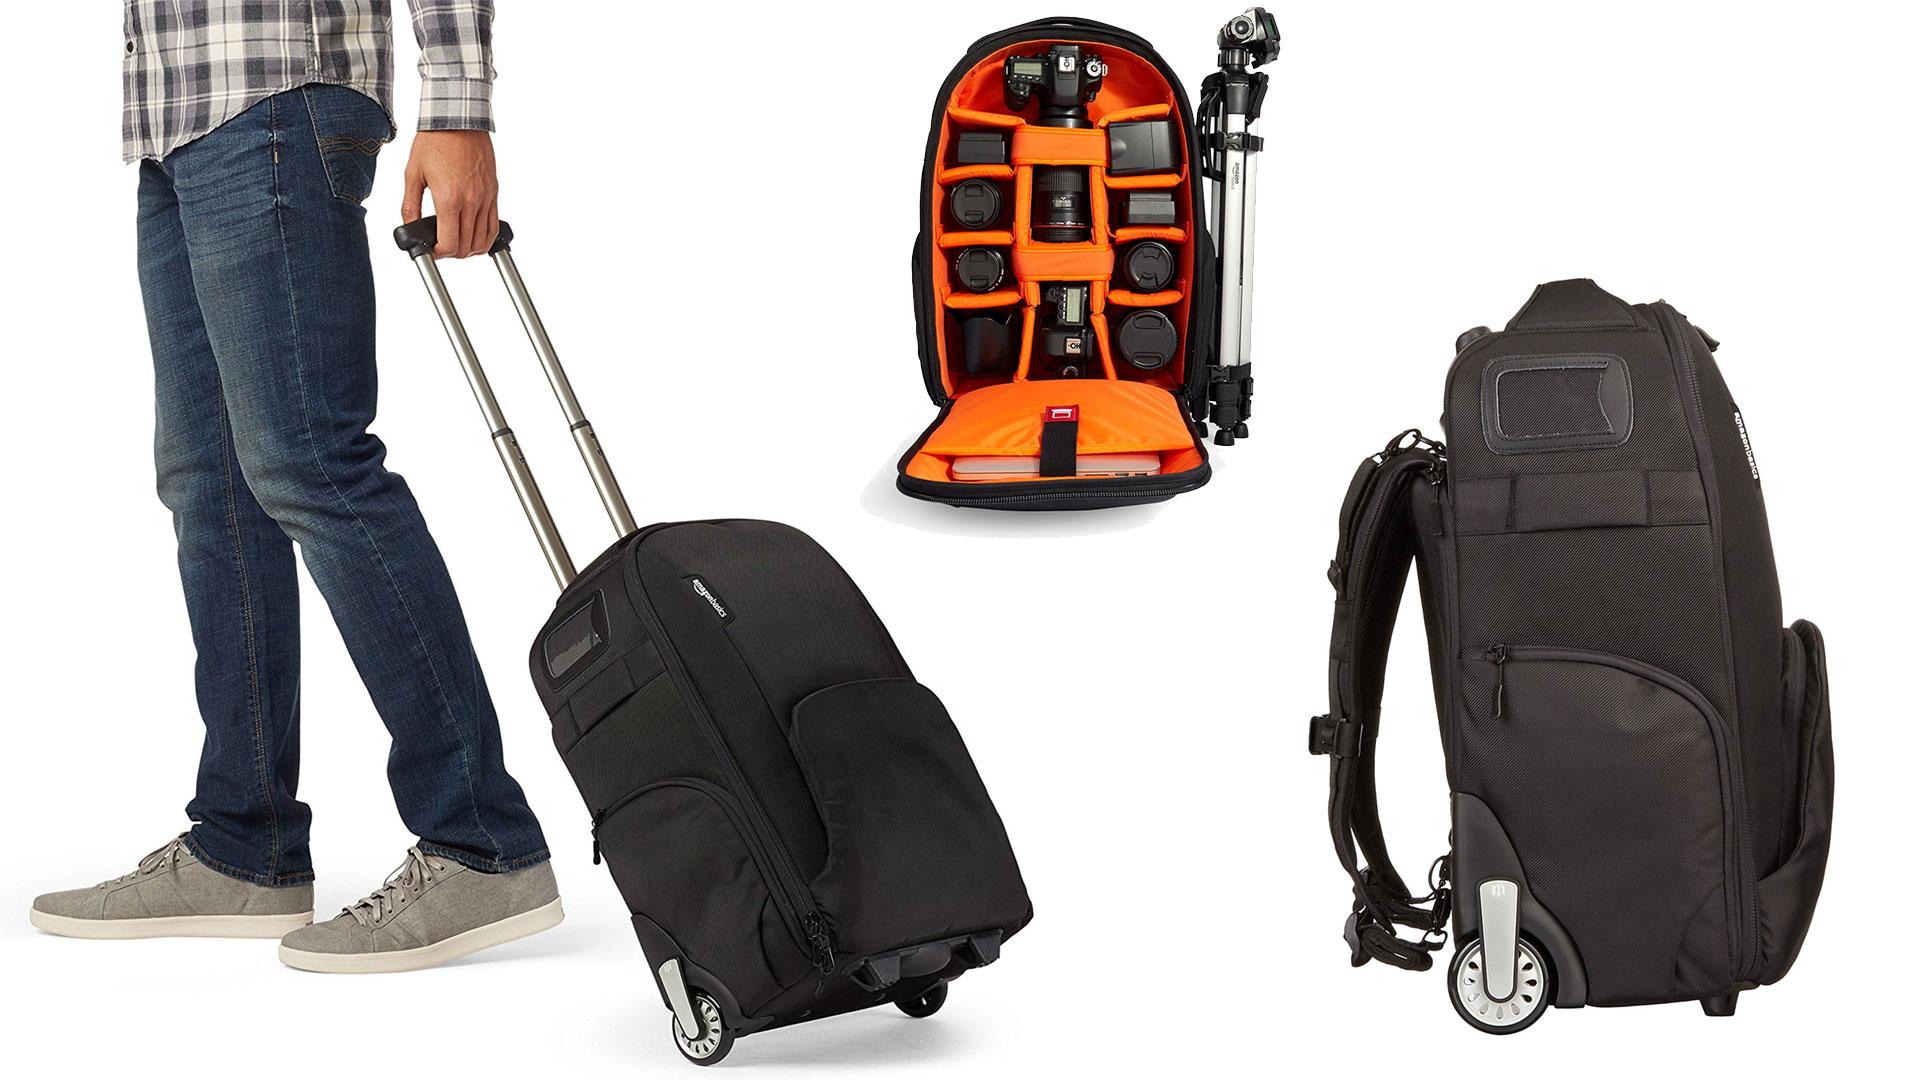 AmazonBasics Convertible Rolling Backpack, best dslr bag, best dslr camera bag, best dslr camera backpack